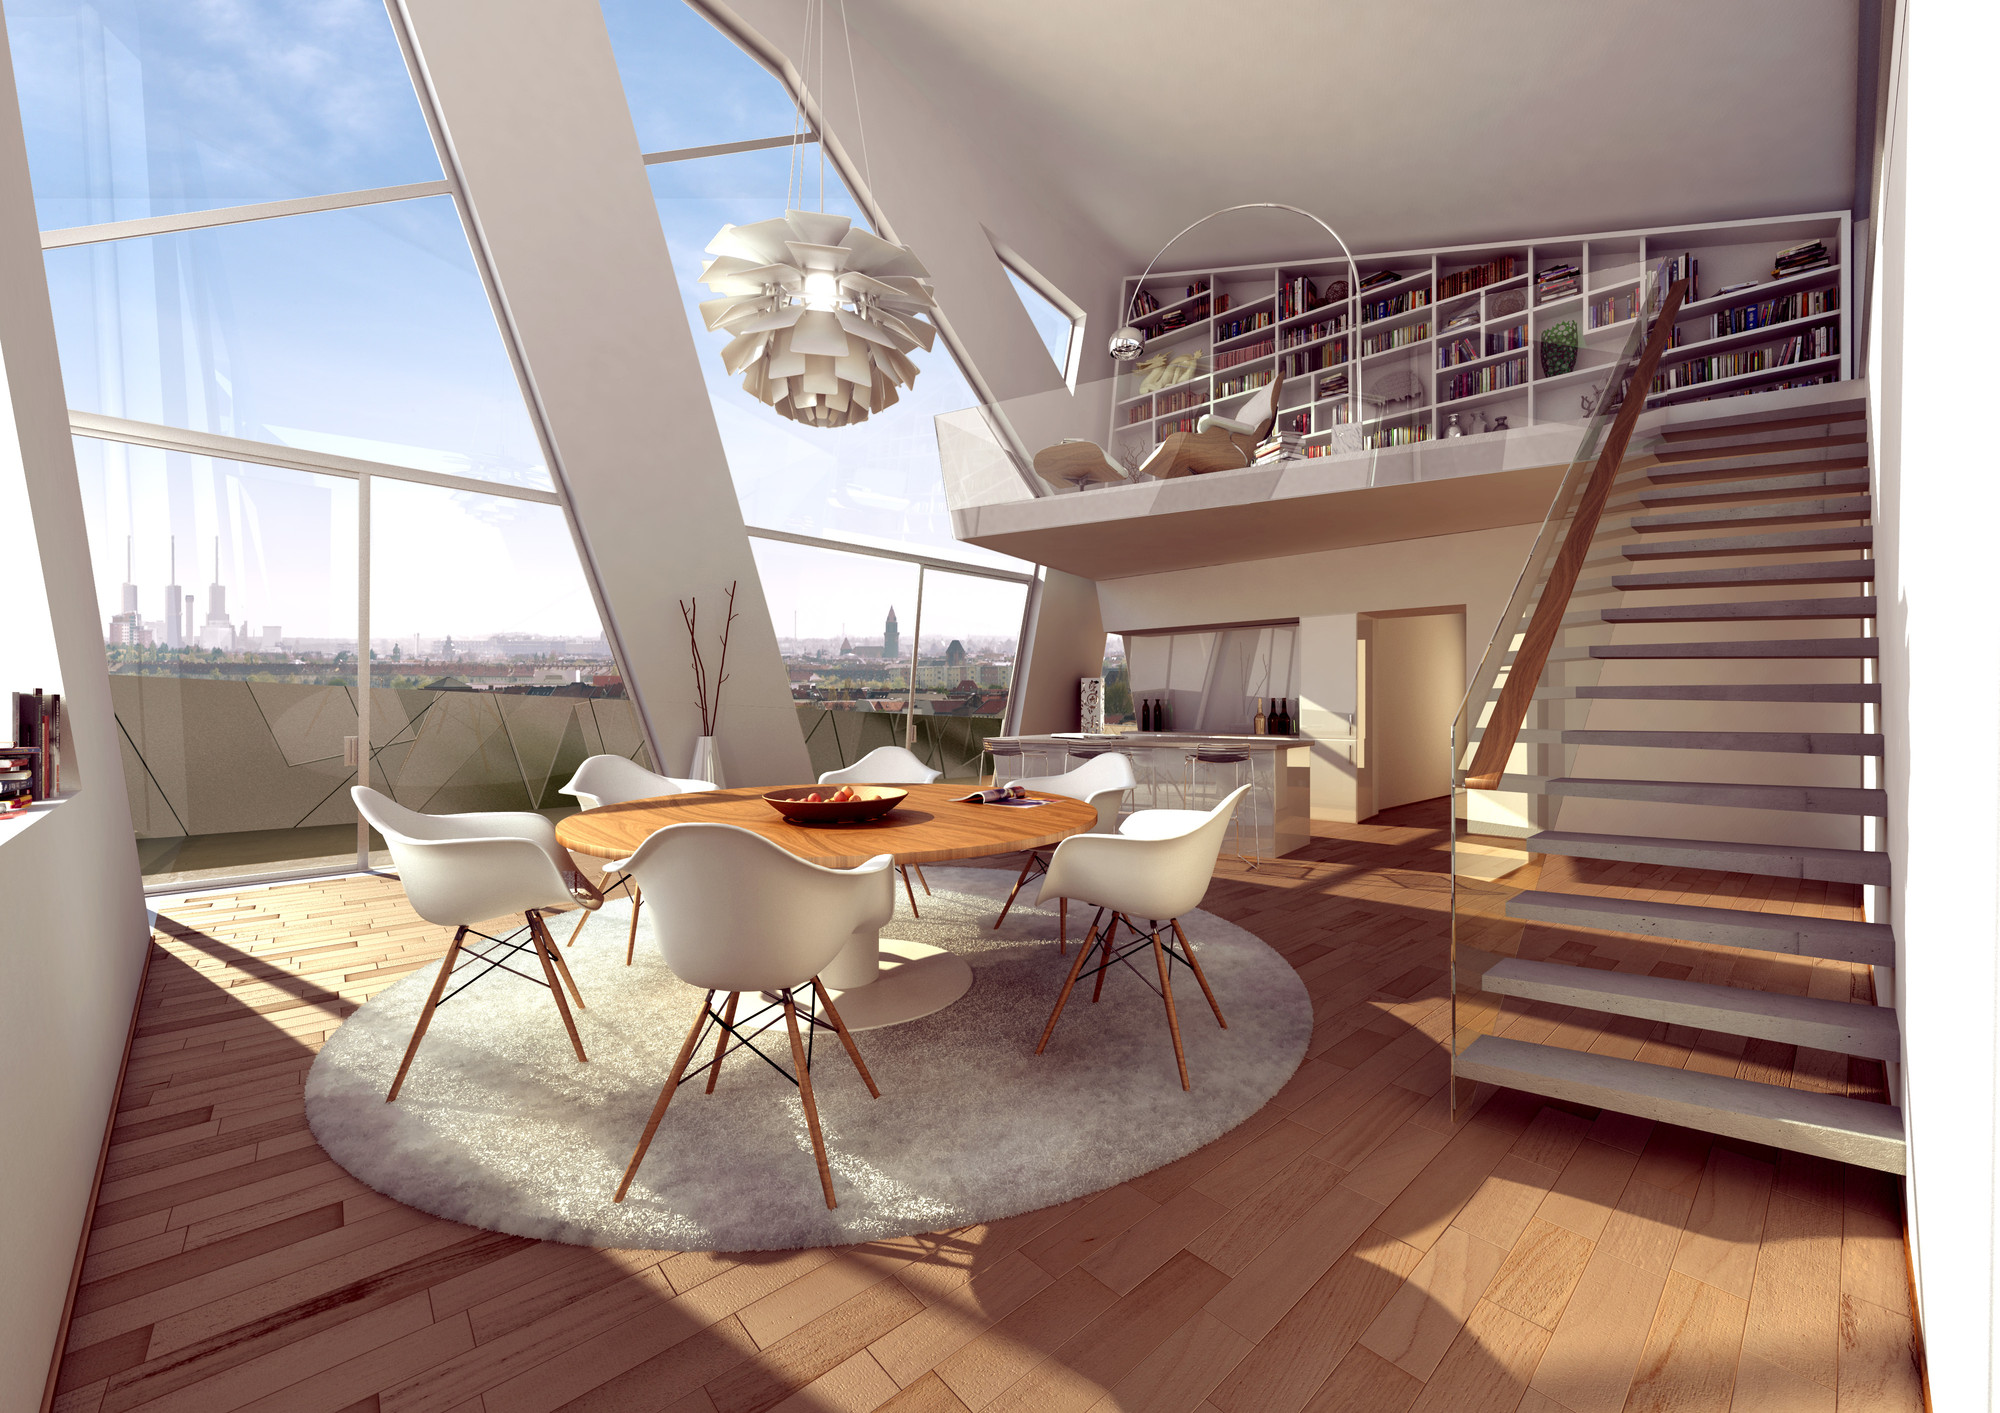 Marvelous Penthouse Interior. Image © PX2